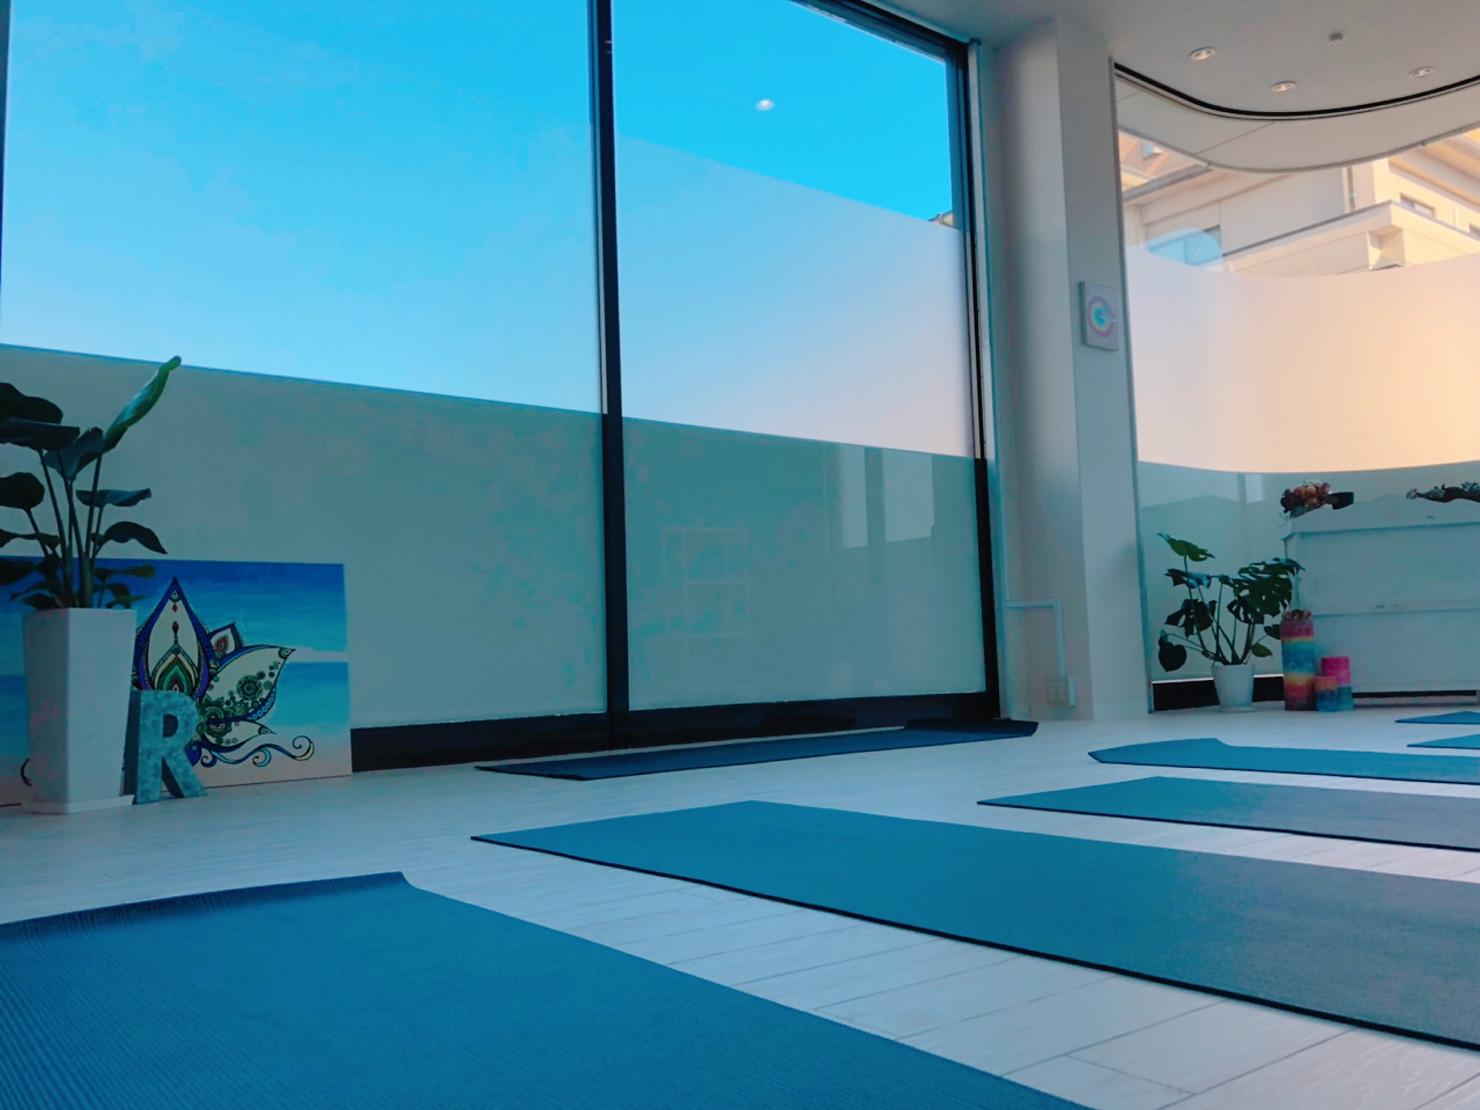 yoga studio roomの画像